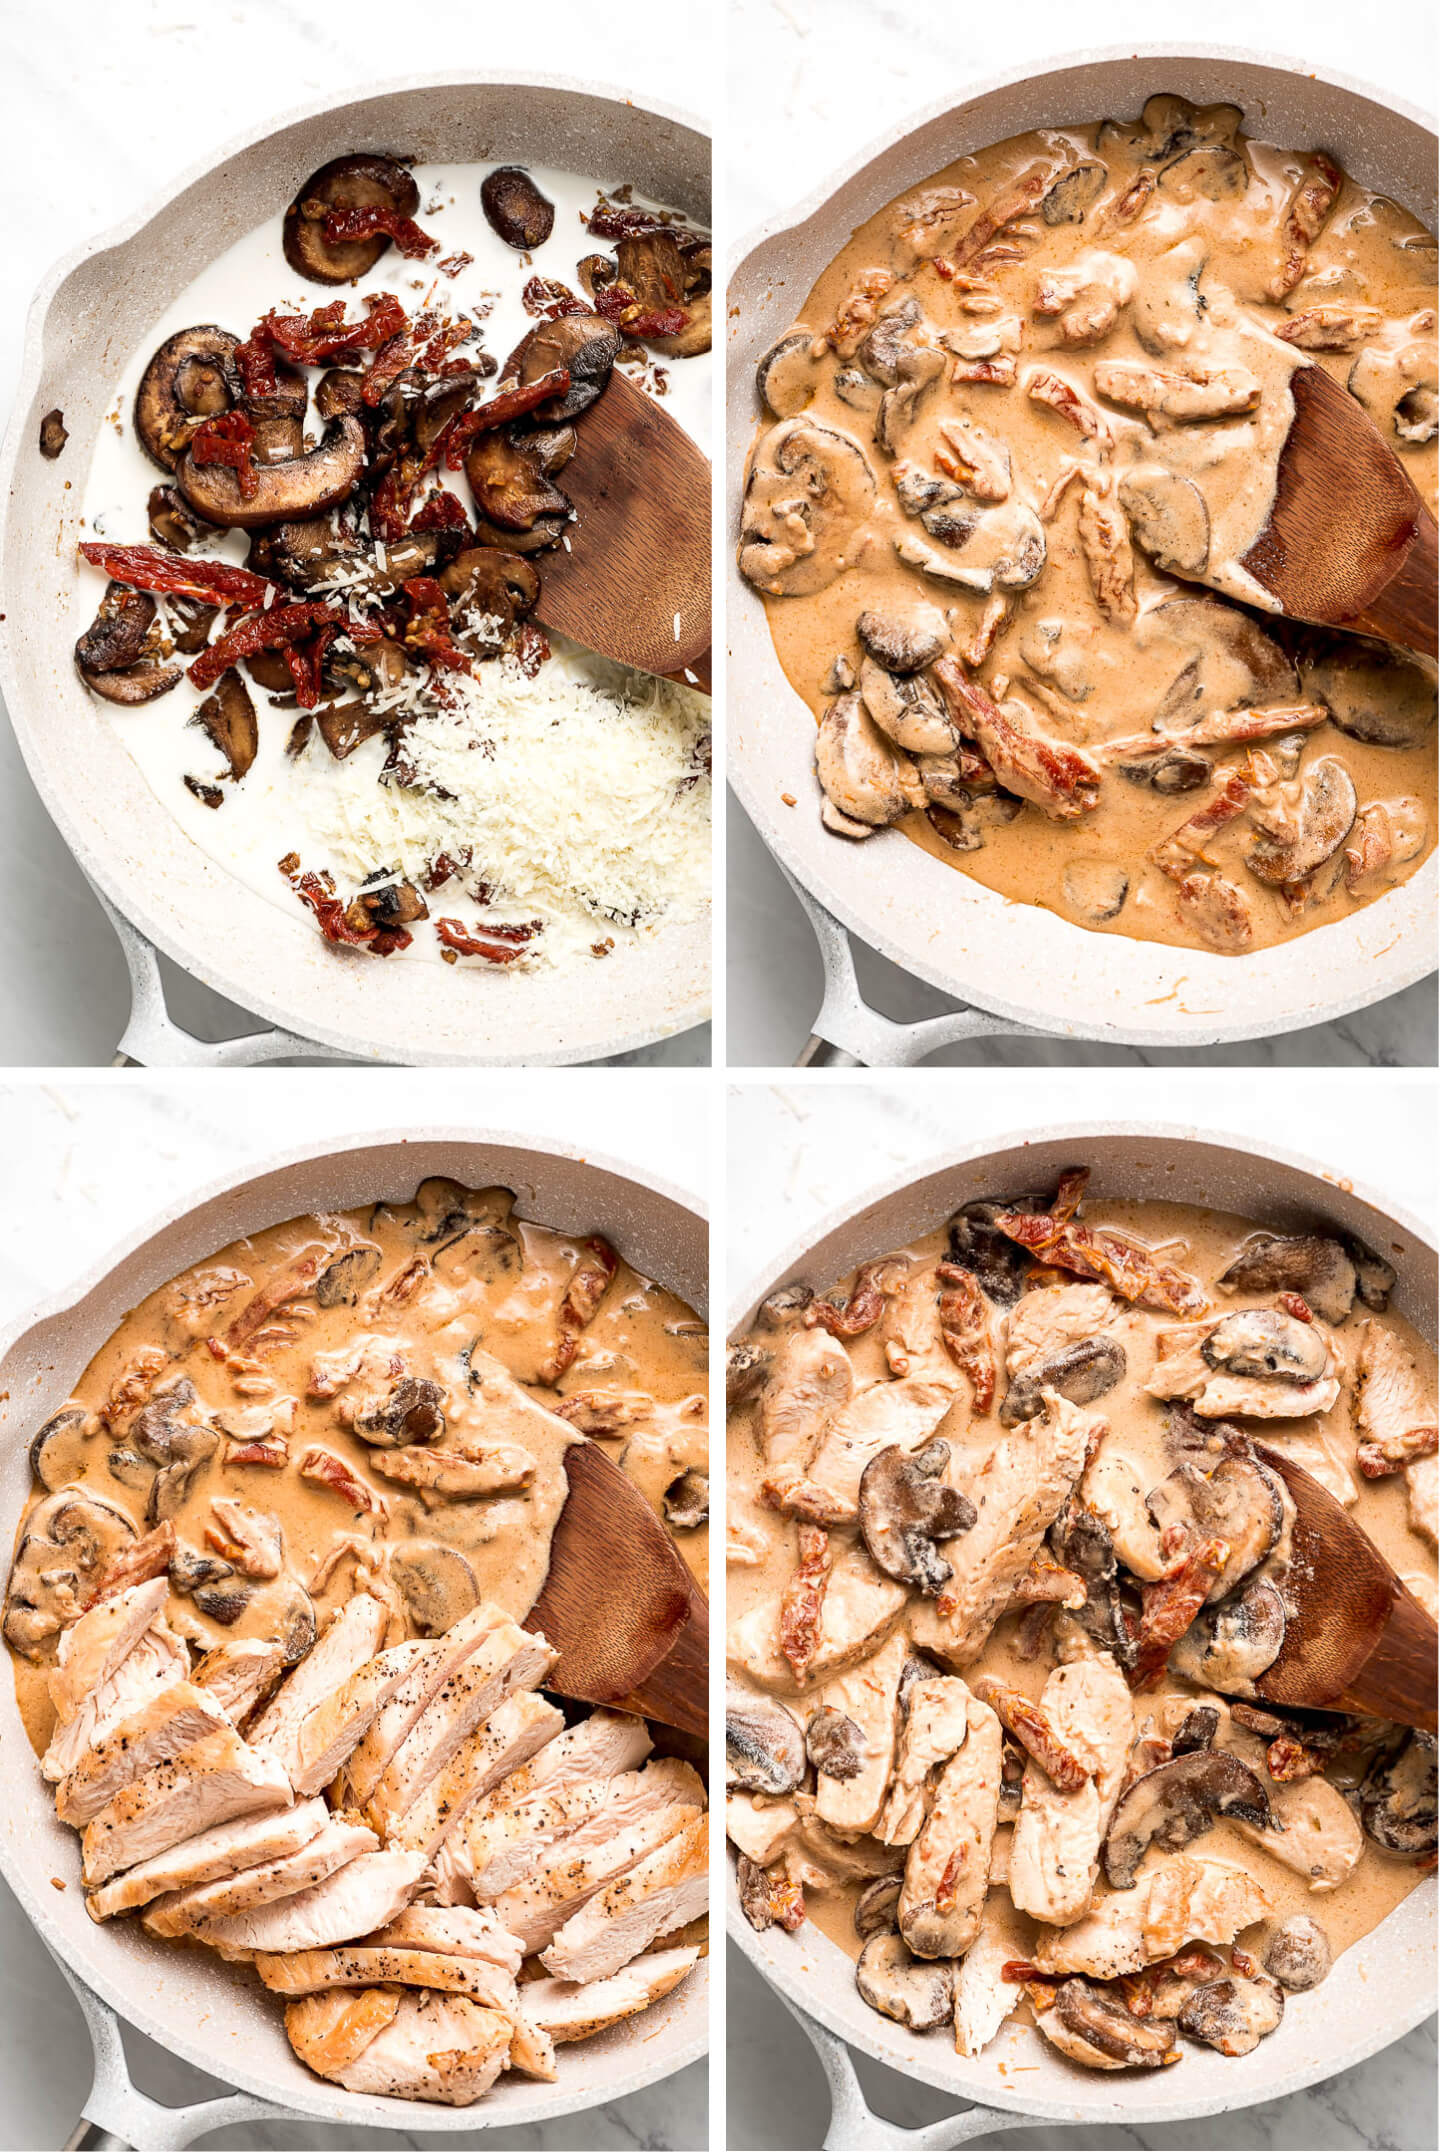 4 photos showing a mushroom, sun dried tomato, chicken cream sauce being made.